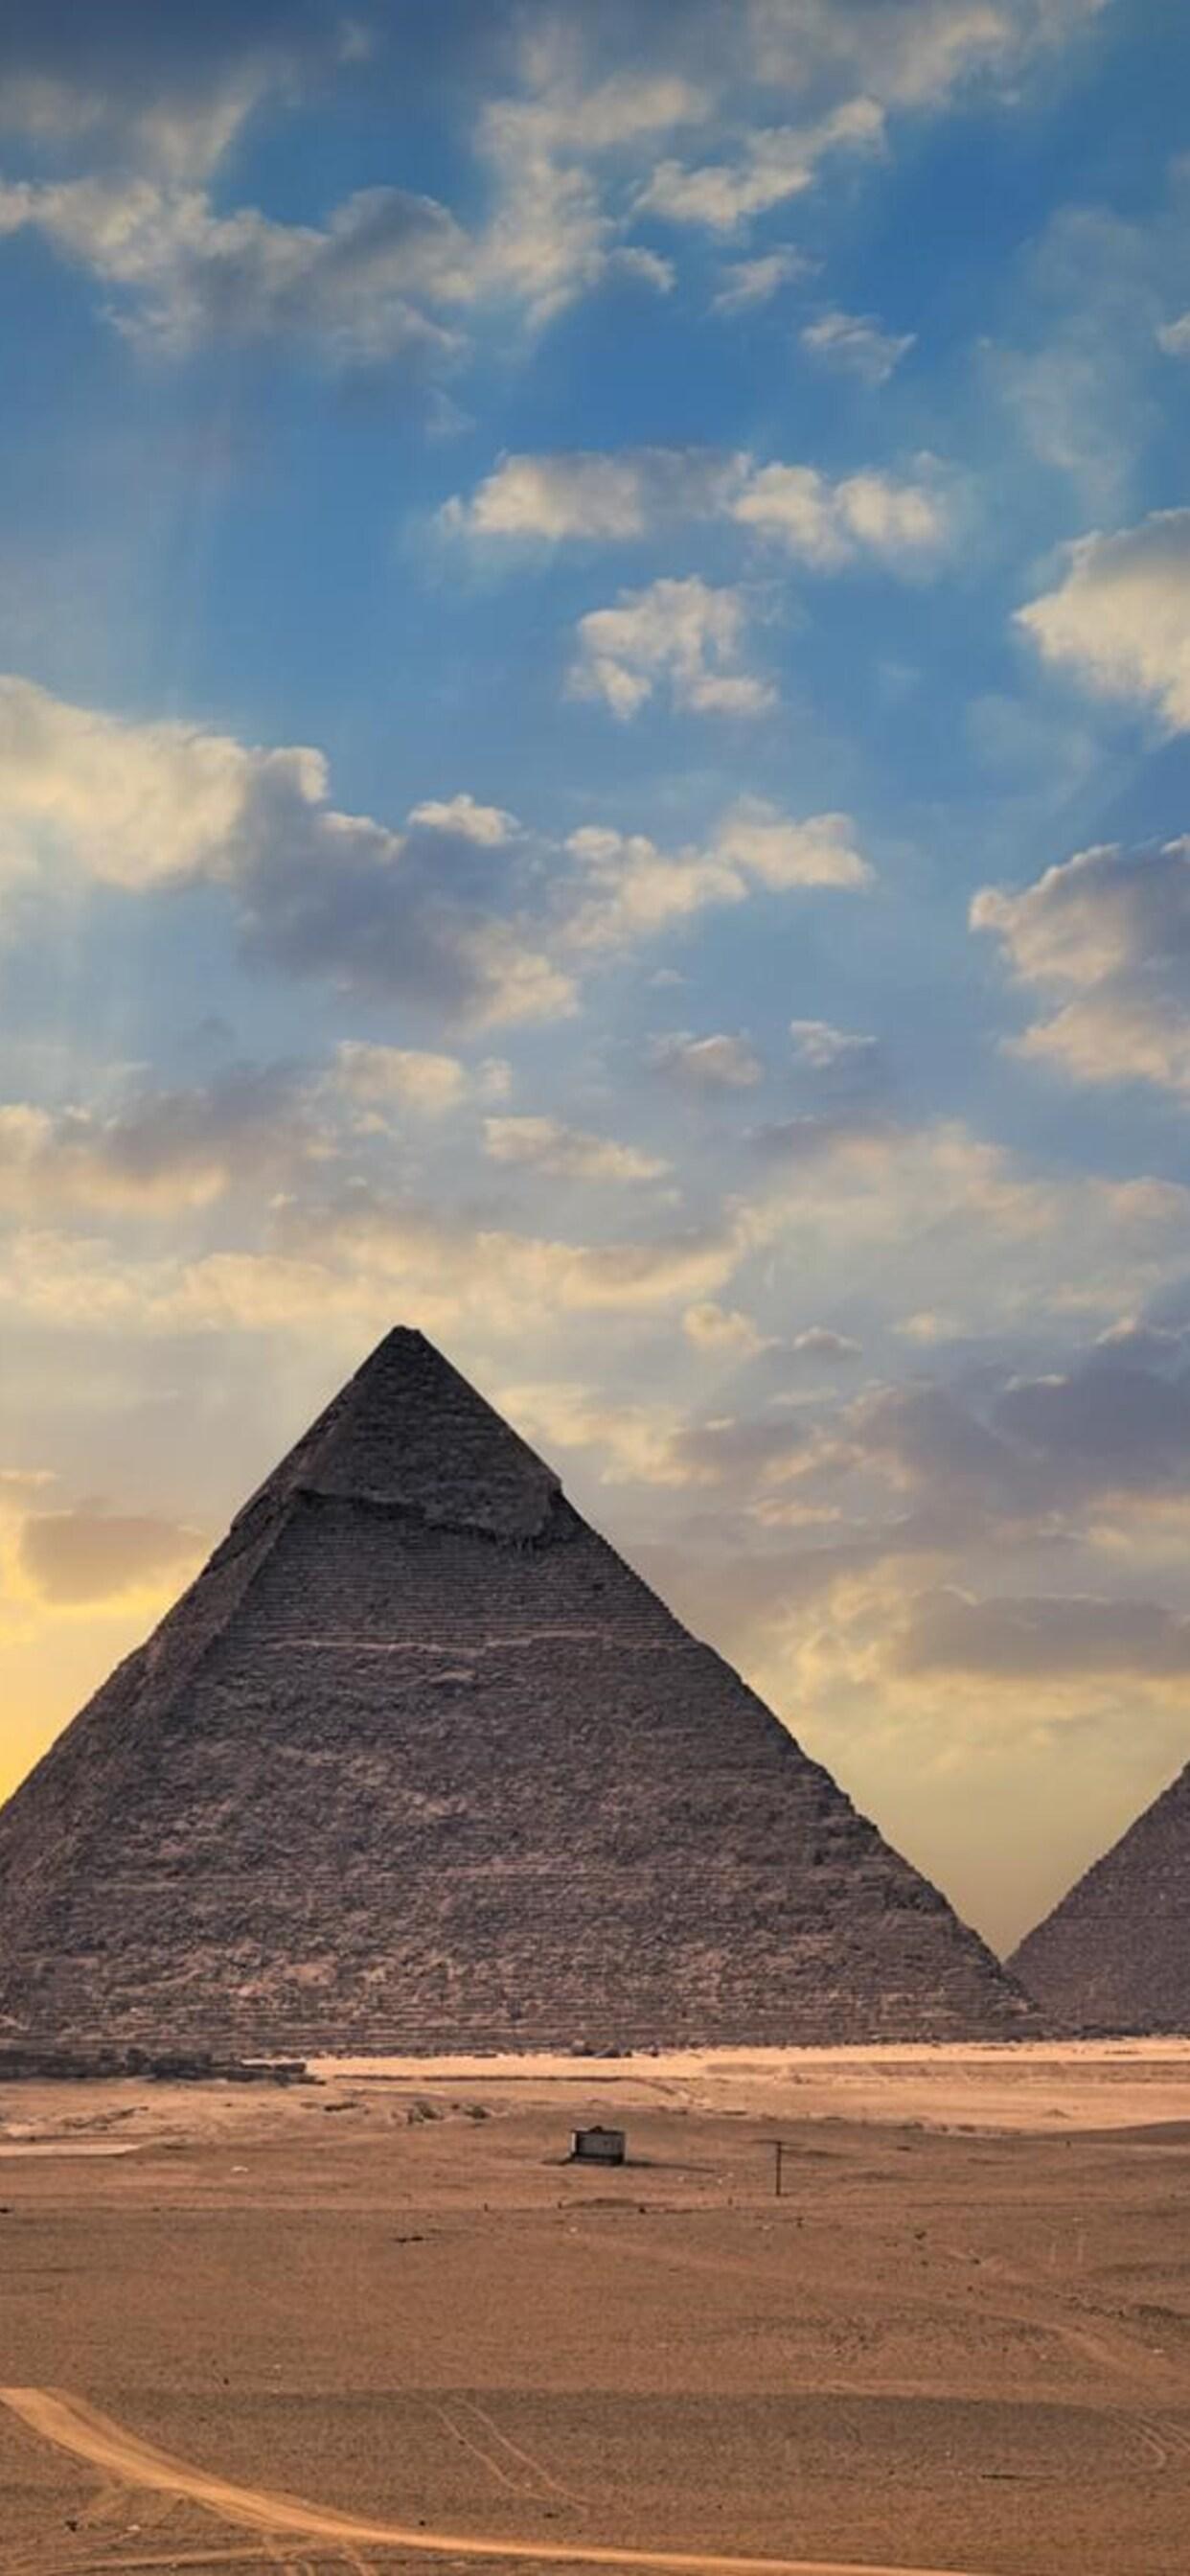 1242x2688 Egypt Pyramids Iphone Xs Max Hd 4k Wallpapers